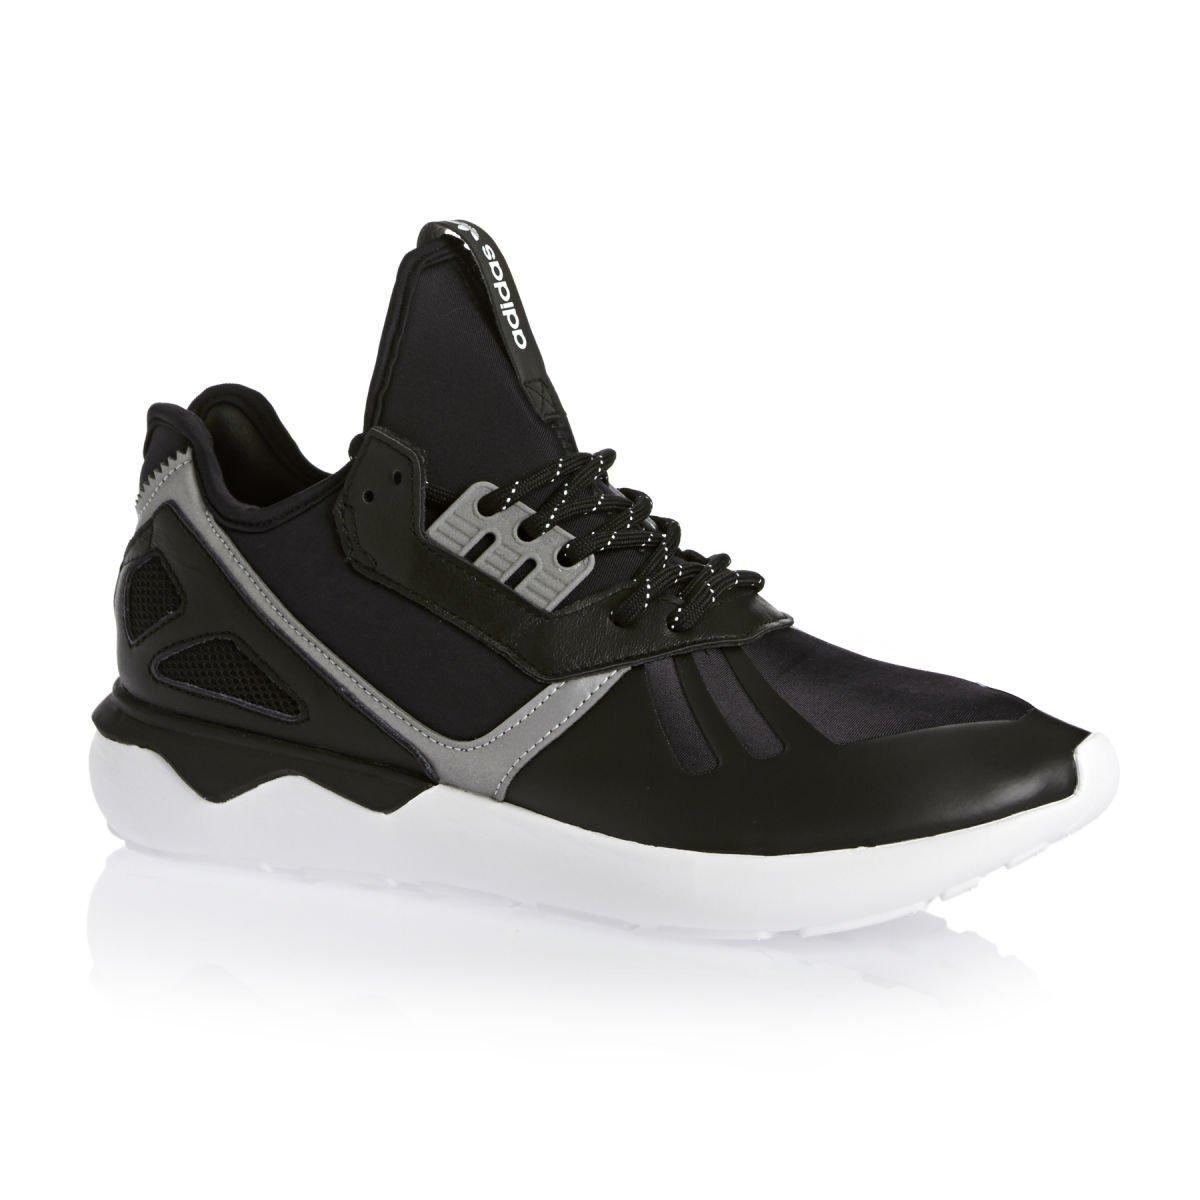 Adidas Unisex-Erwachsene Tubular Tubular Tubular Runner Gymnastikschuhe, Schwarz, Small 5ecc17